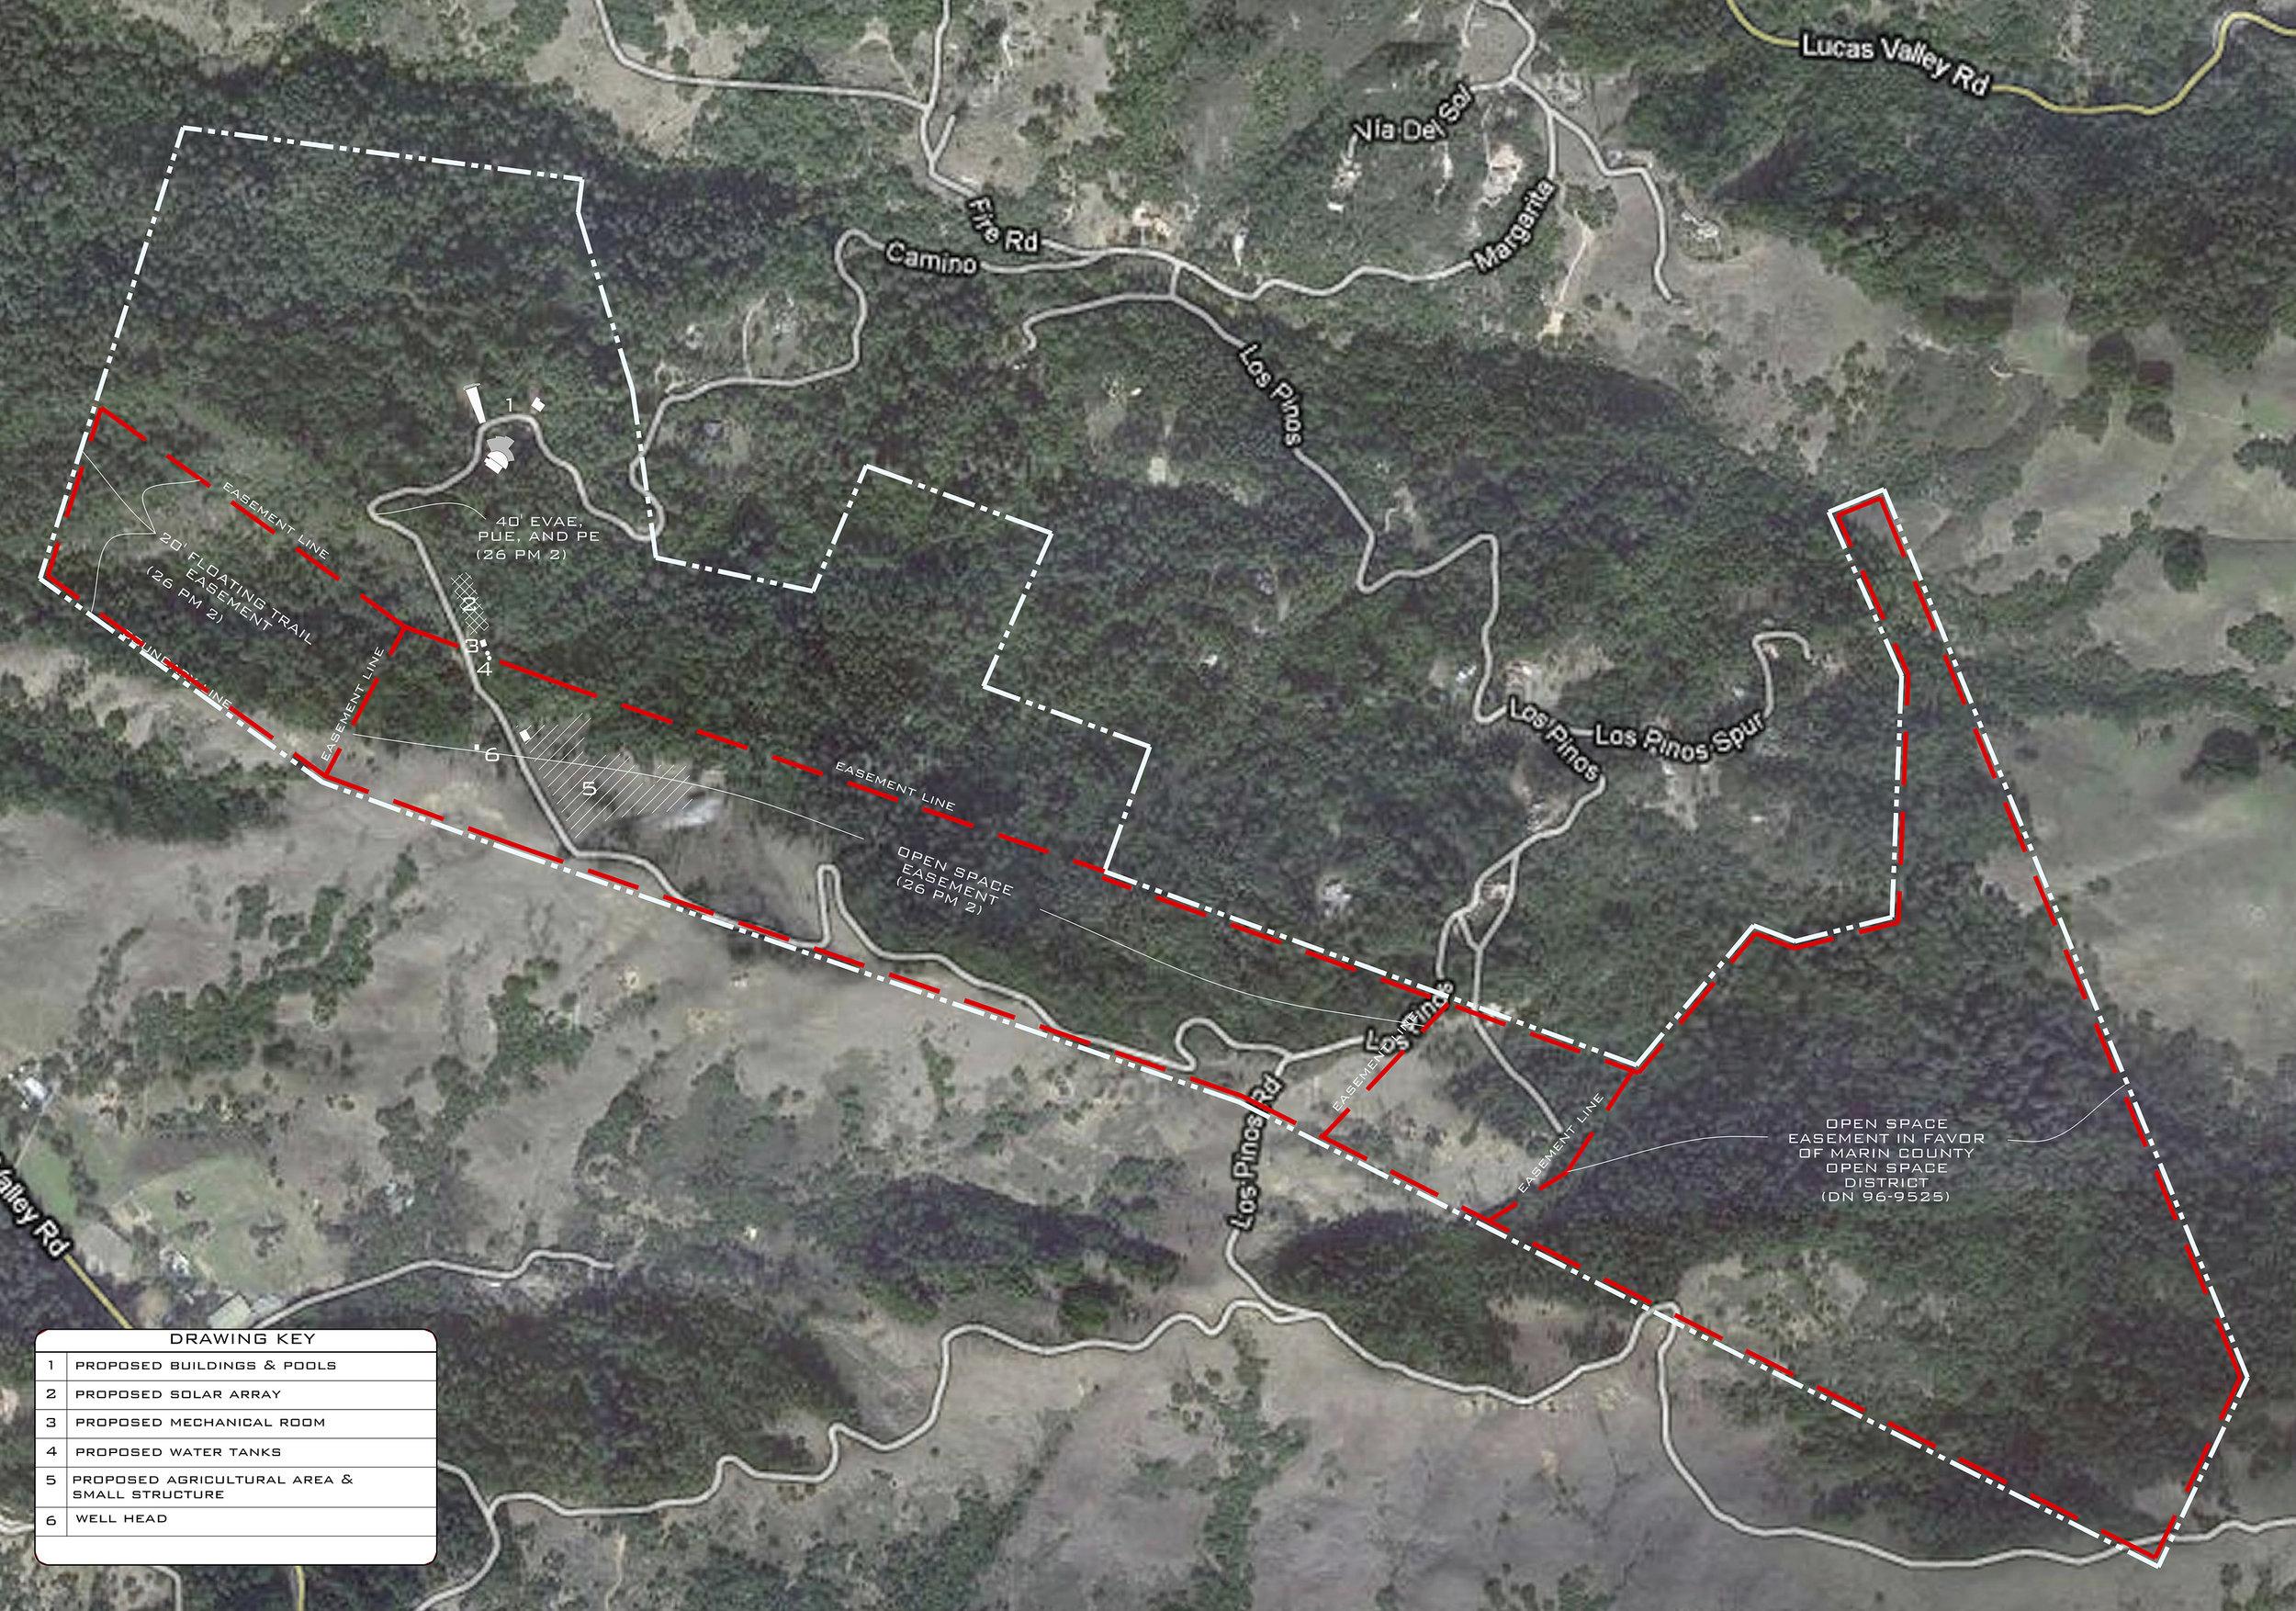 RedwoodcreekMtZionMAPS (dragged) 2 copy.jpg